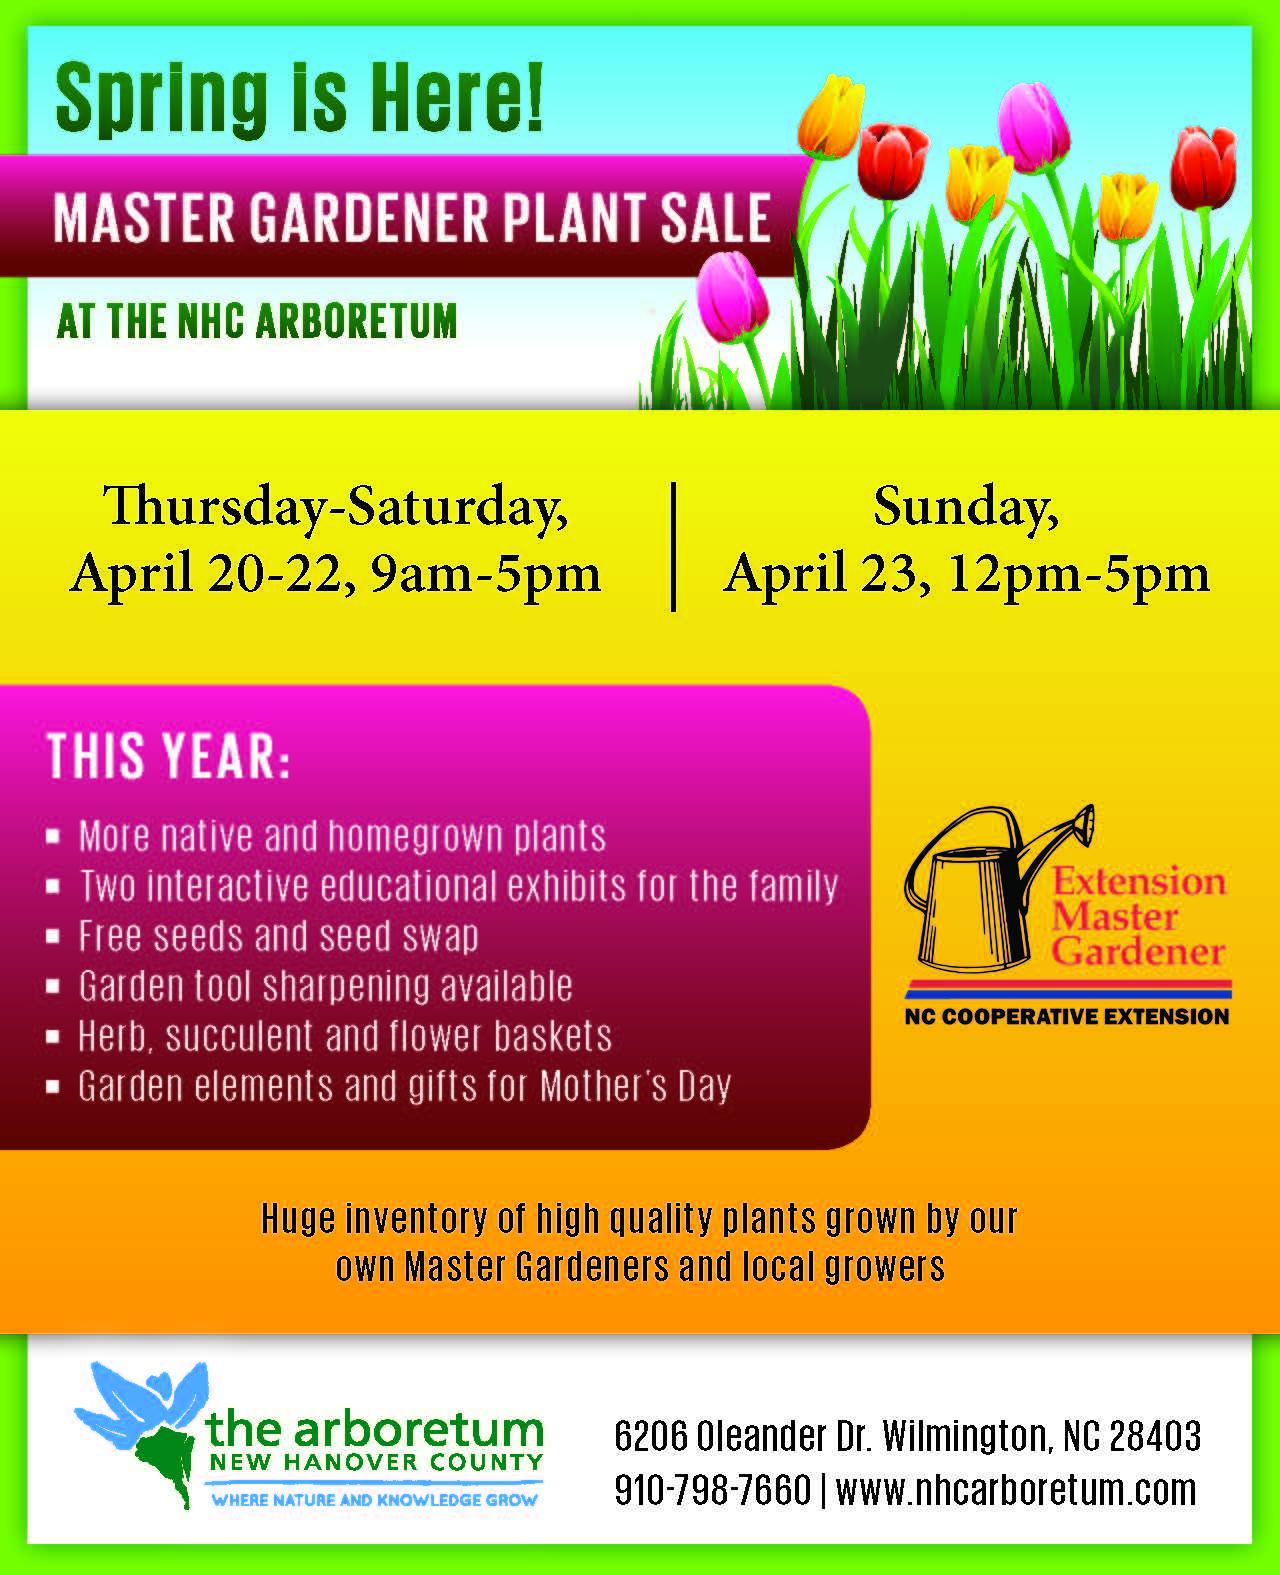 2017 New Hanover County Master Gardener Plant Sale North Carolina Cooperative Extension